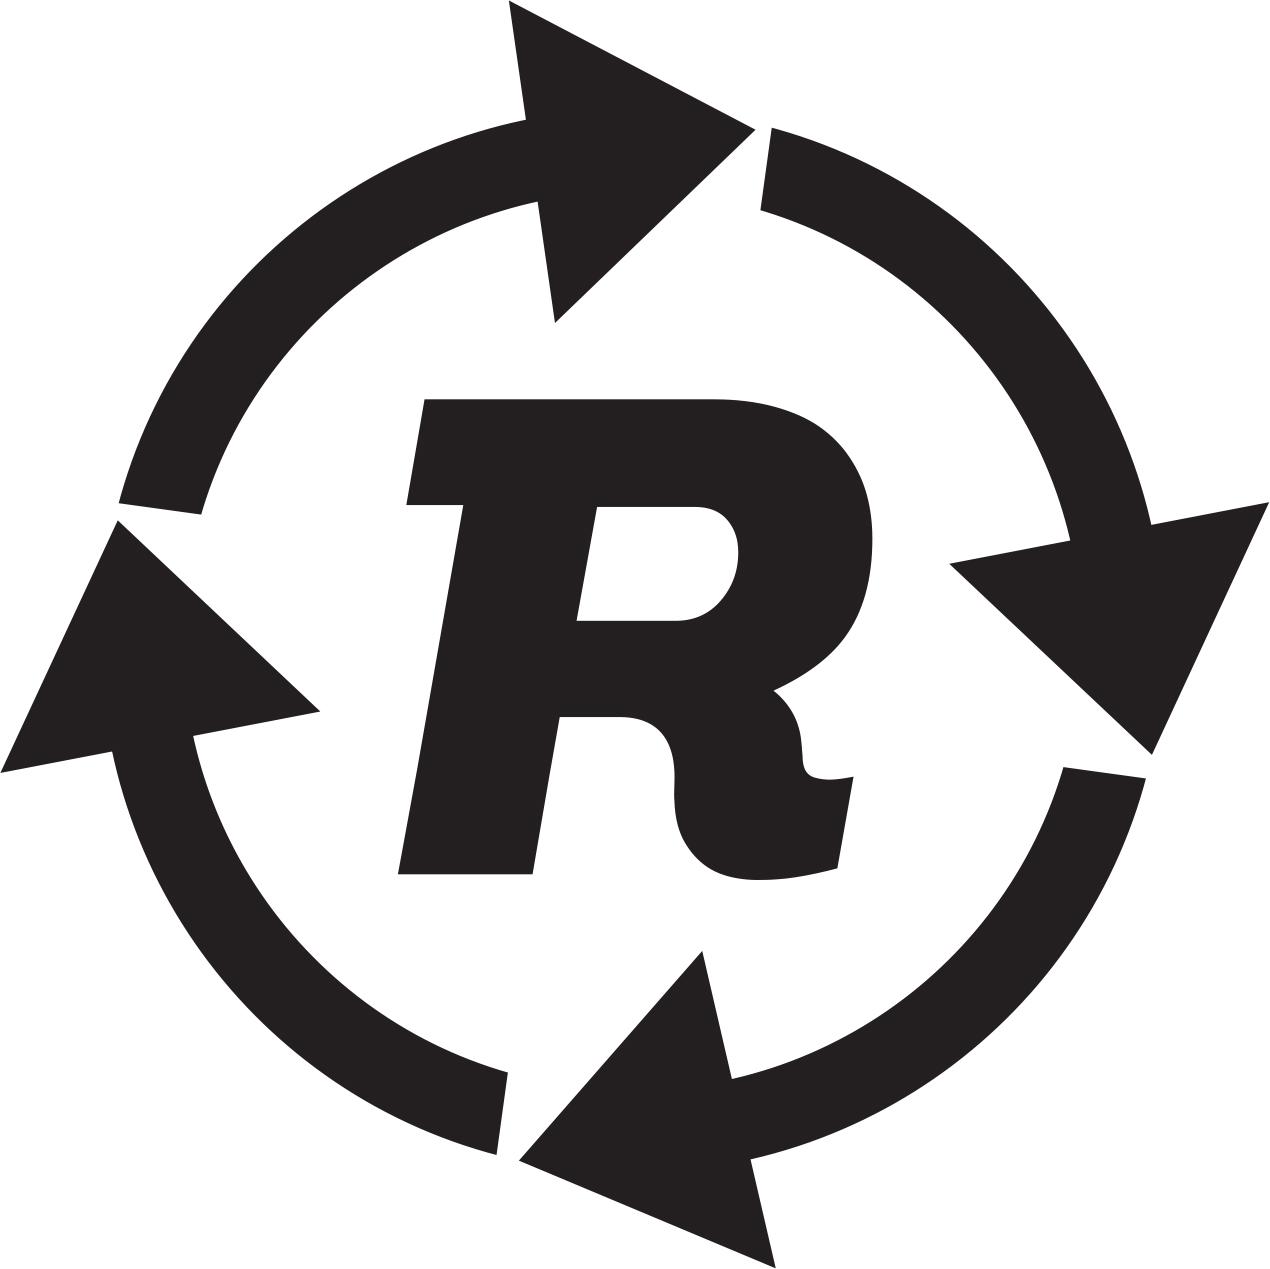 RevolutionLogo_RECYCLE_BLK copy.jpg